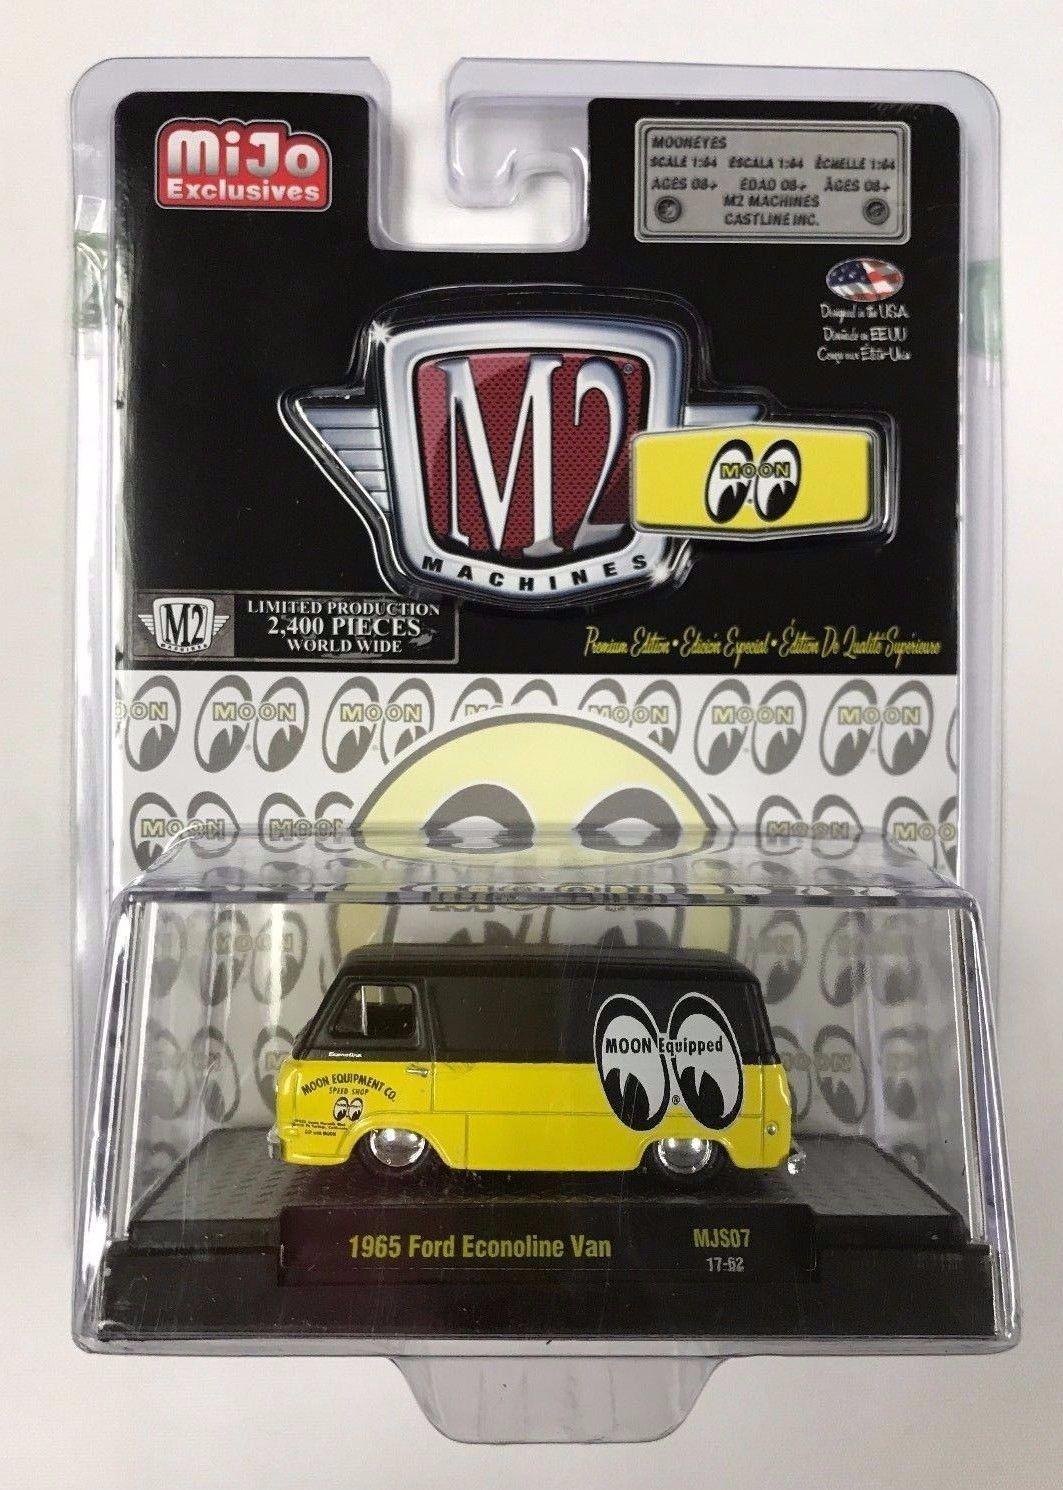 M2 Machines - 1965 Ford Econoline Van - MiJo Exclusivo - Limitado 2400 pcs